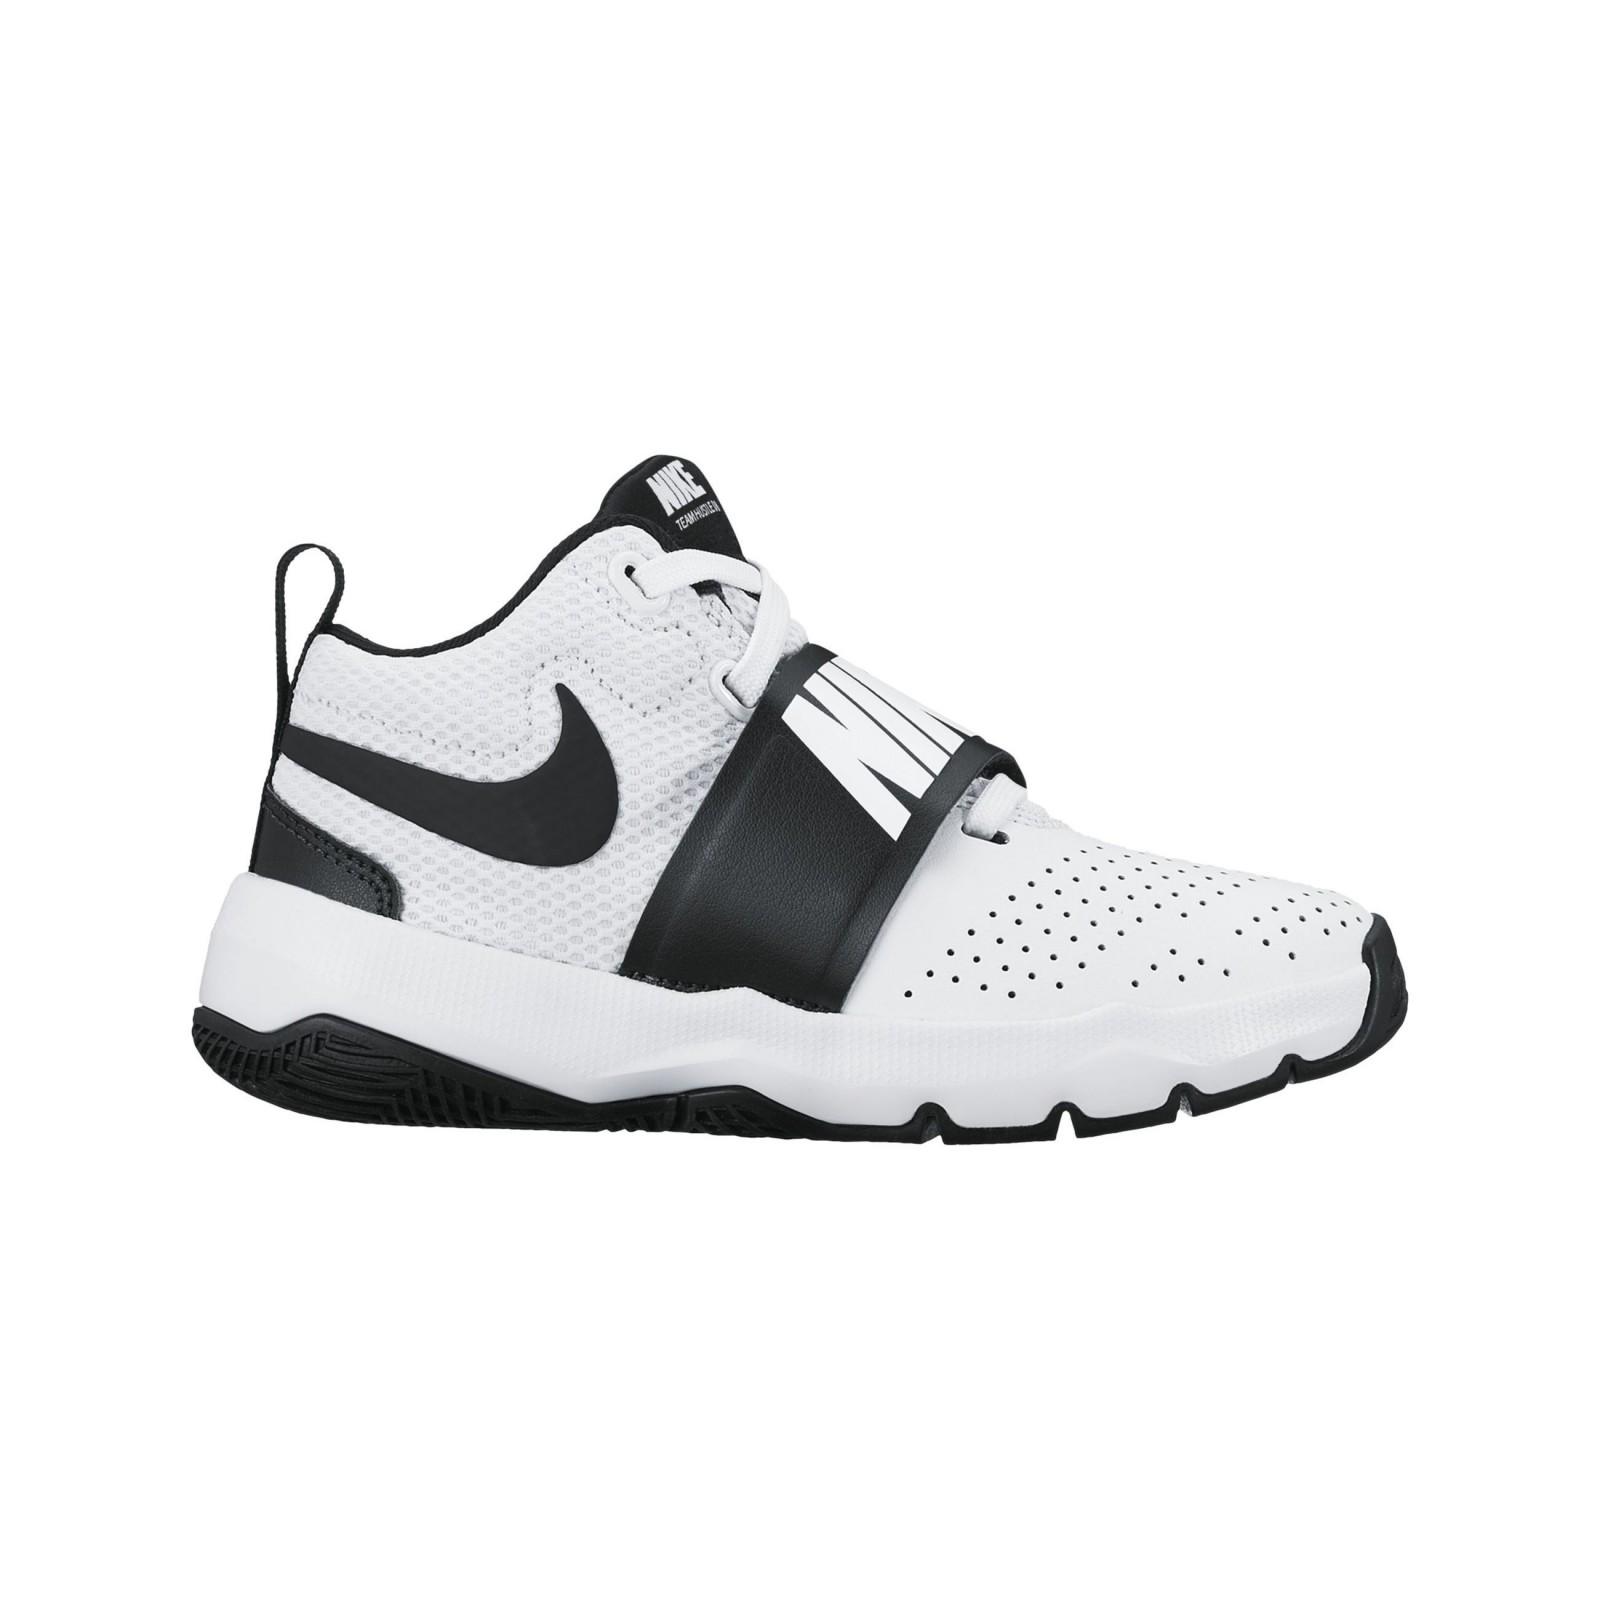 bd910beb8b1 Dětské tenisky Nike TEAM HUSTLE D 8 (PS)